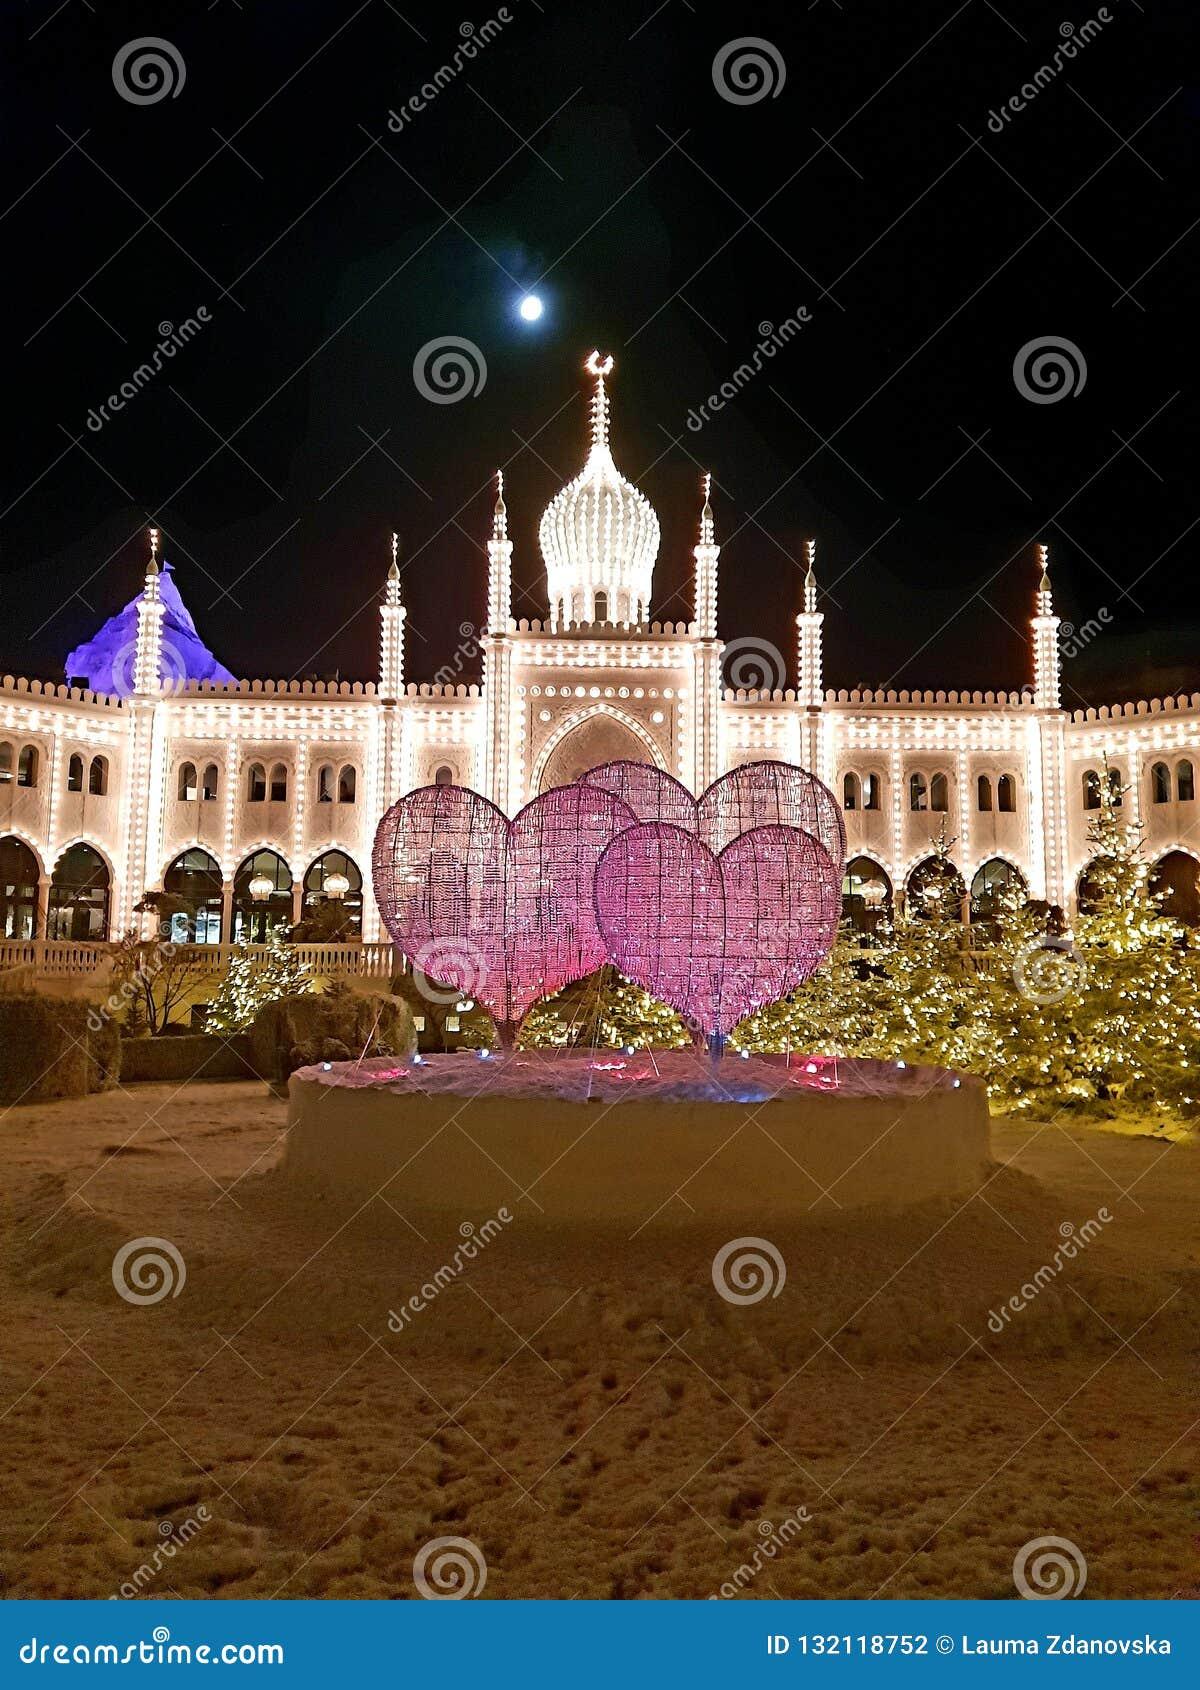 Tivoli& x27;s palace with christmas decorations